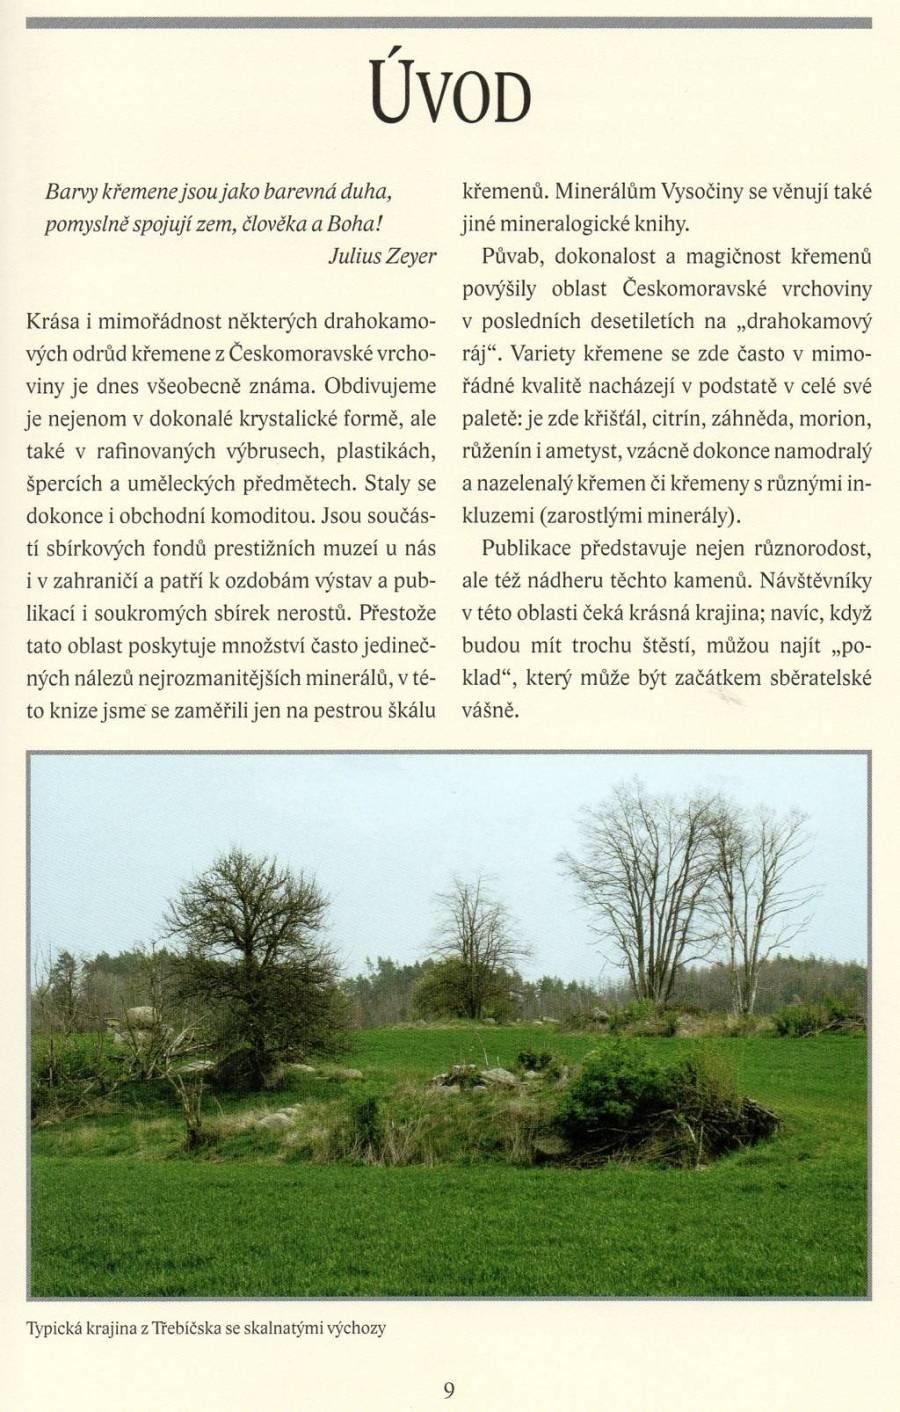 kremeny-ceskomoravske-vrchoviny-uvod